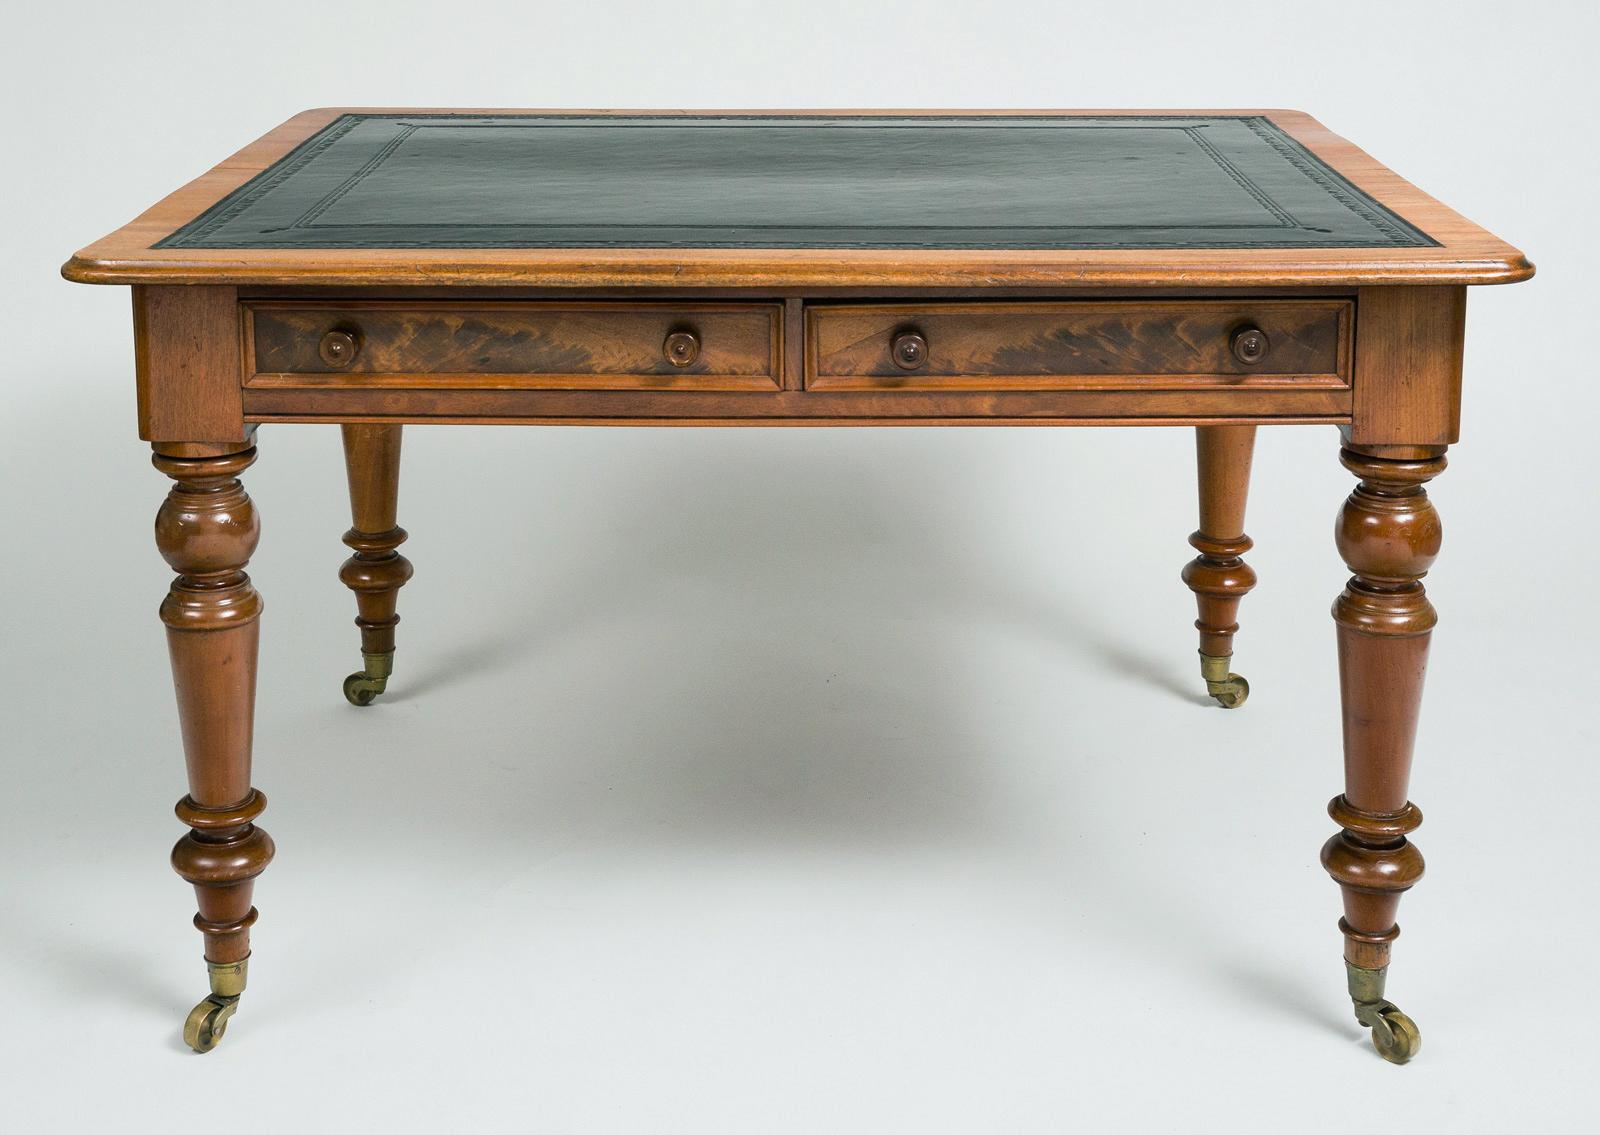 English Antique Mahogany Writing Table Or Desk